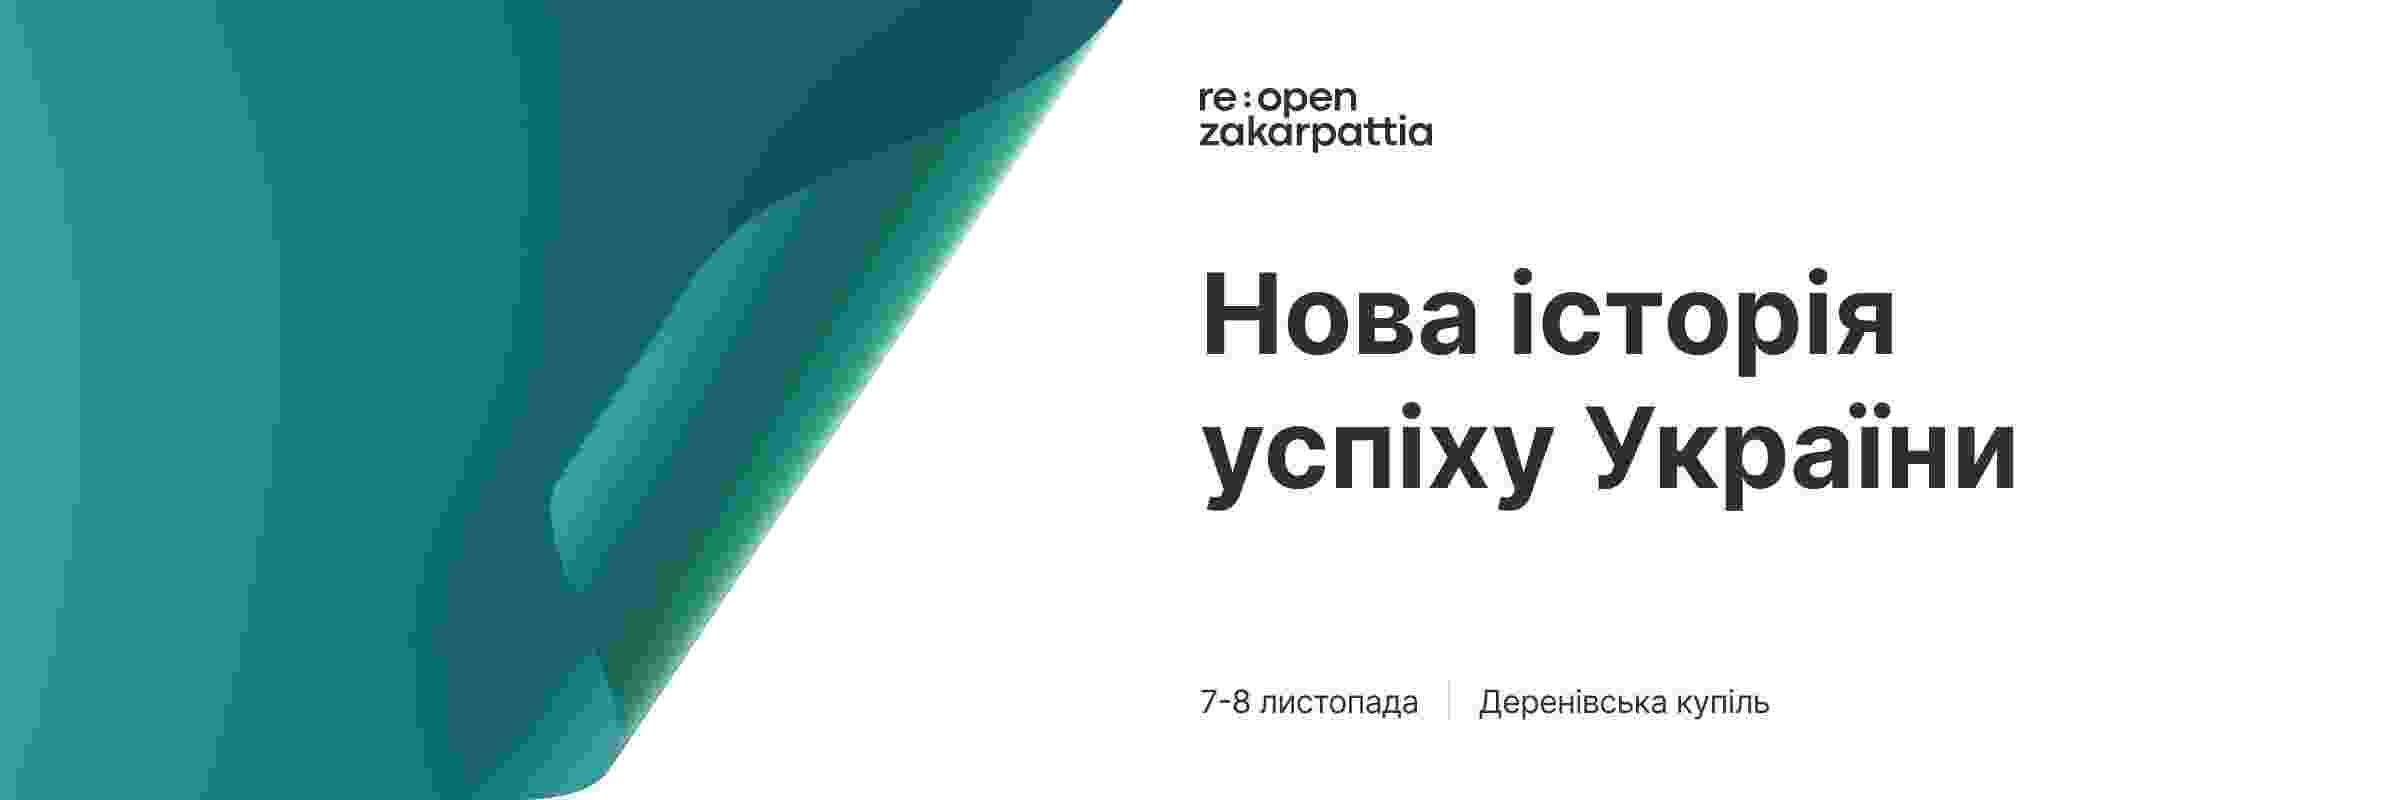 Reopenzakarpattia Image1